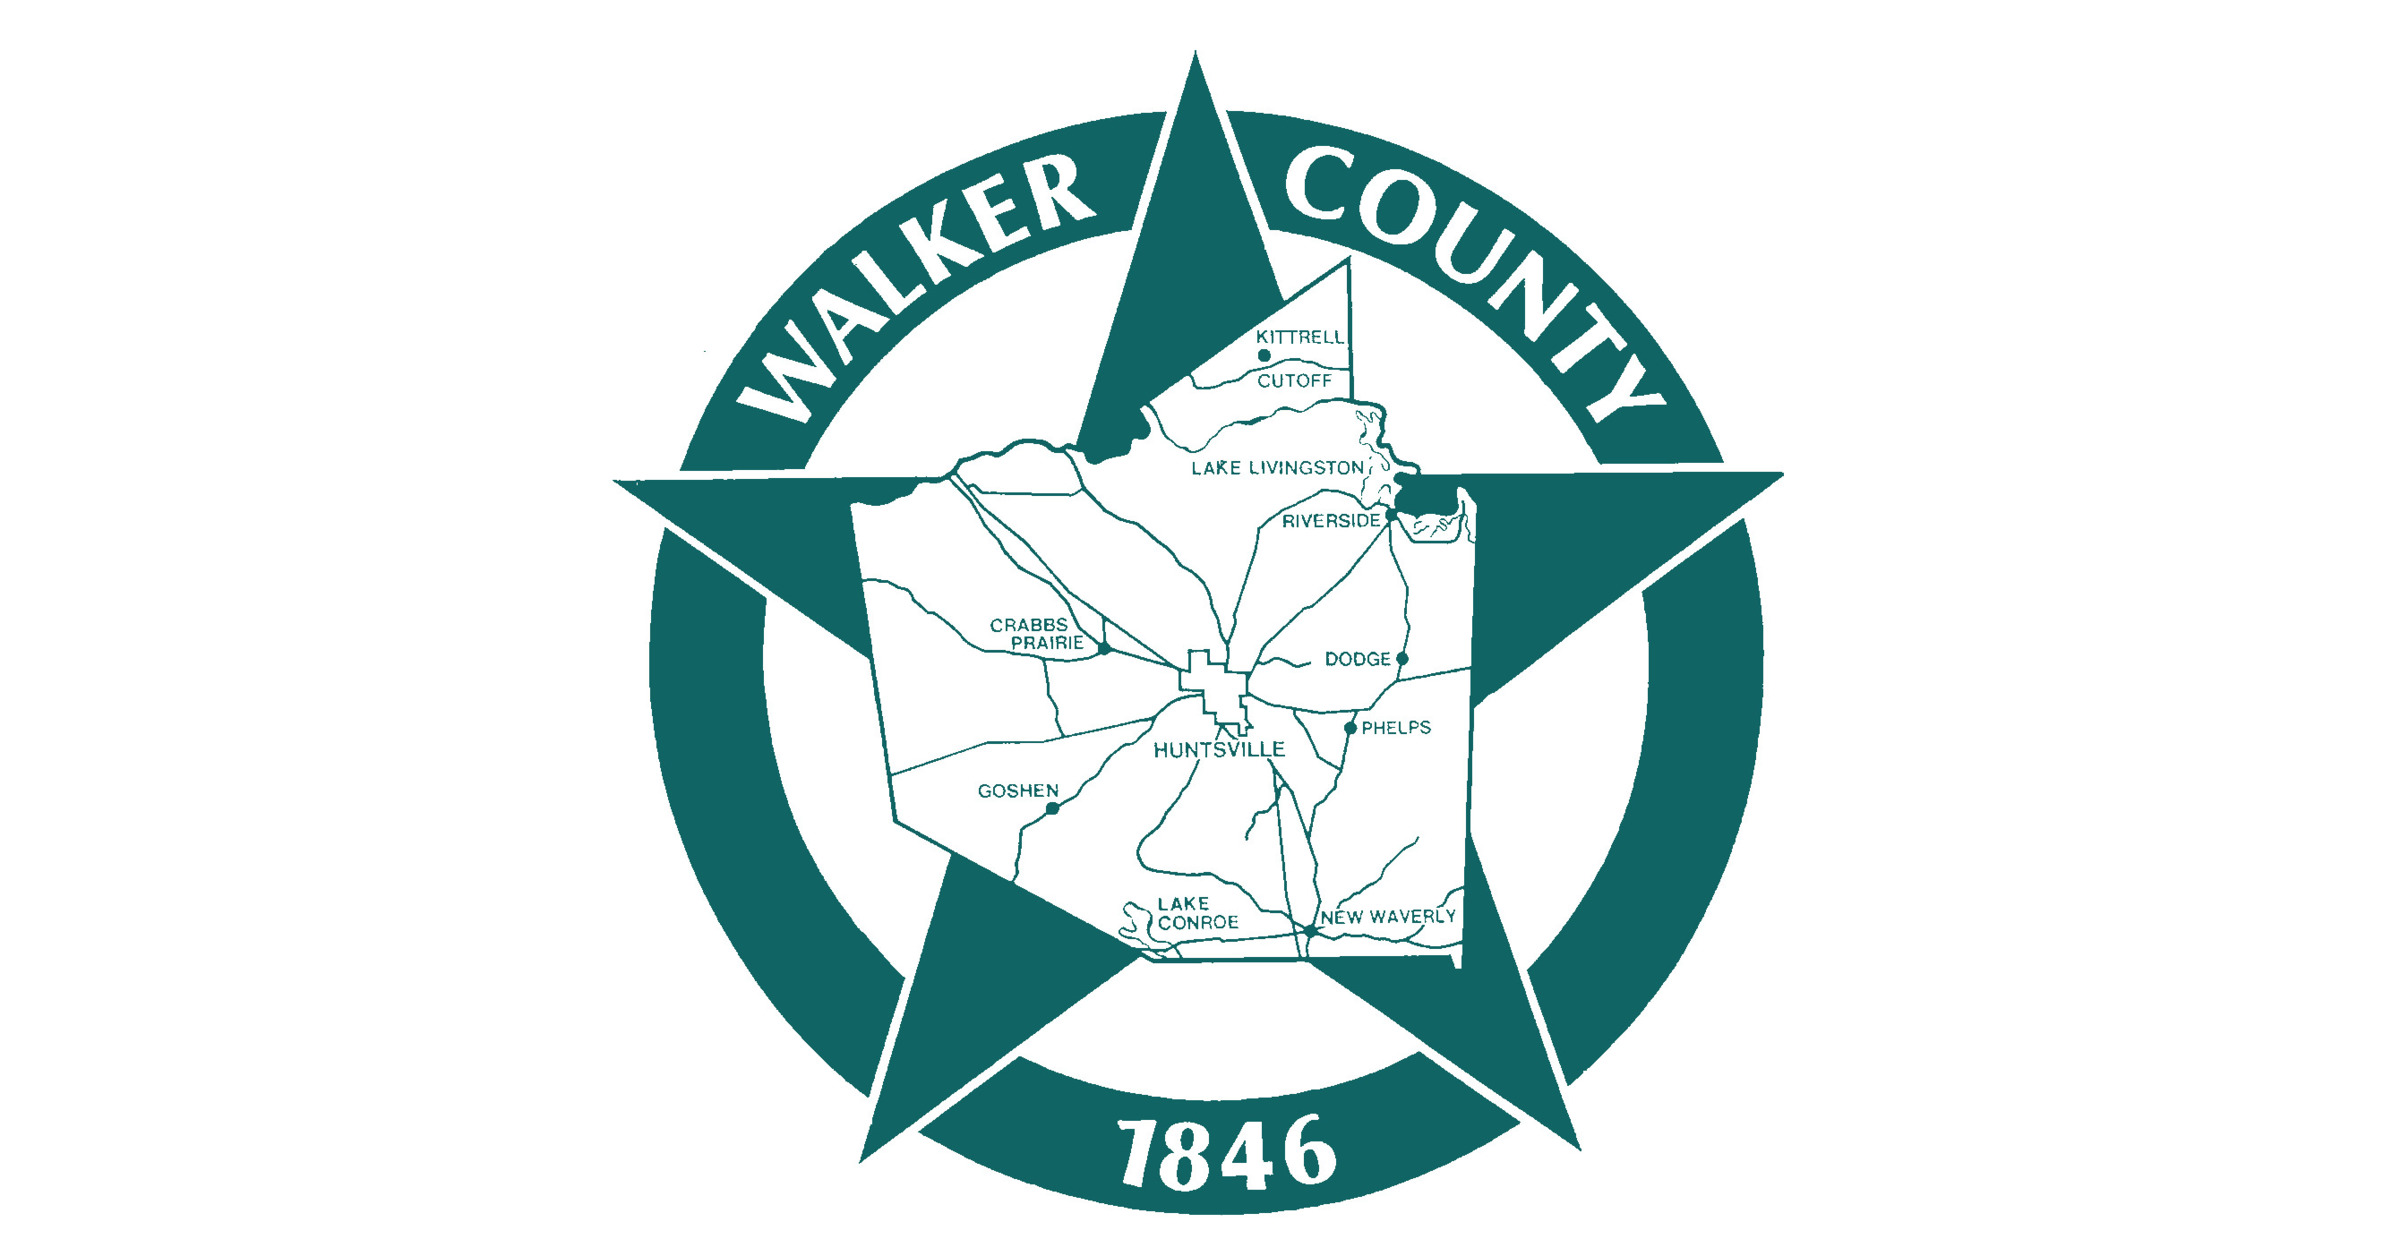 Cities in Walker County, AL